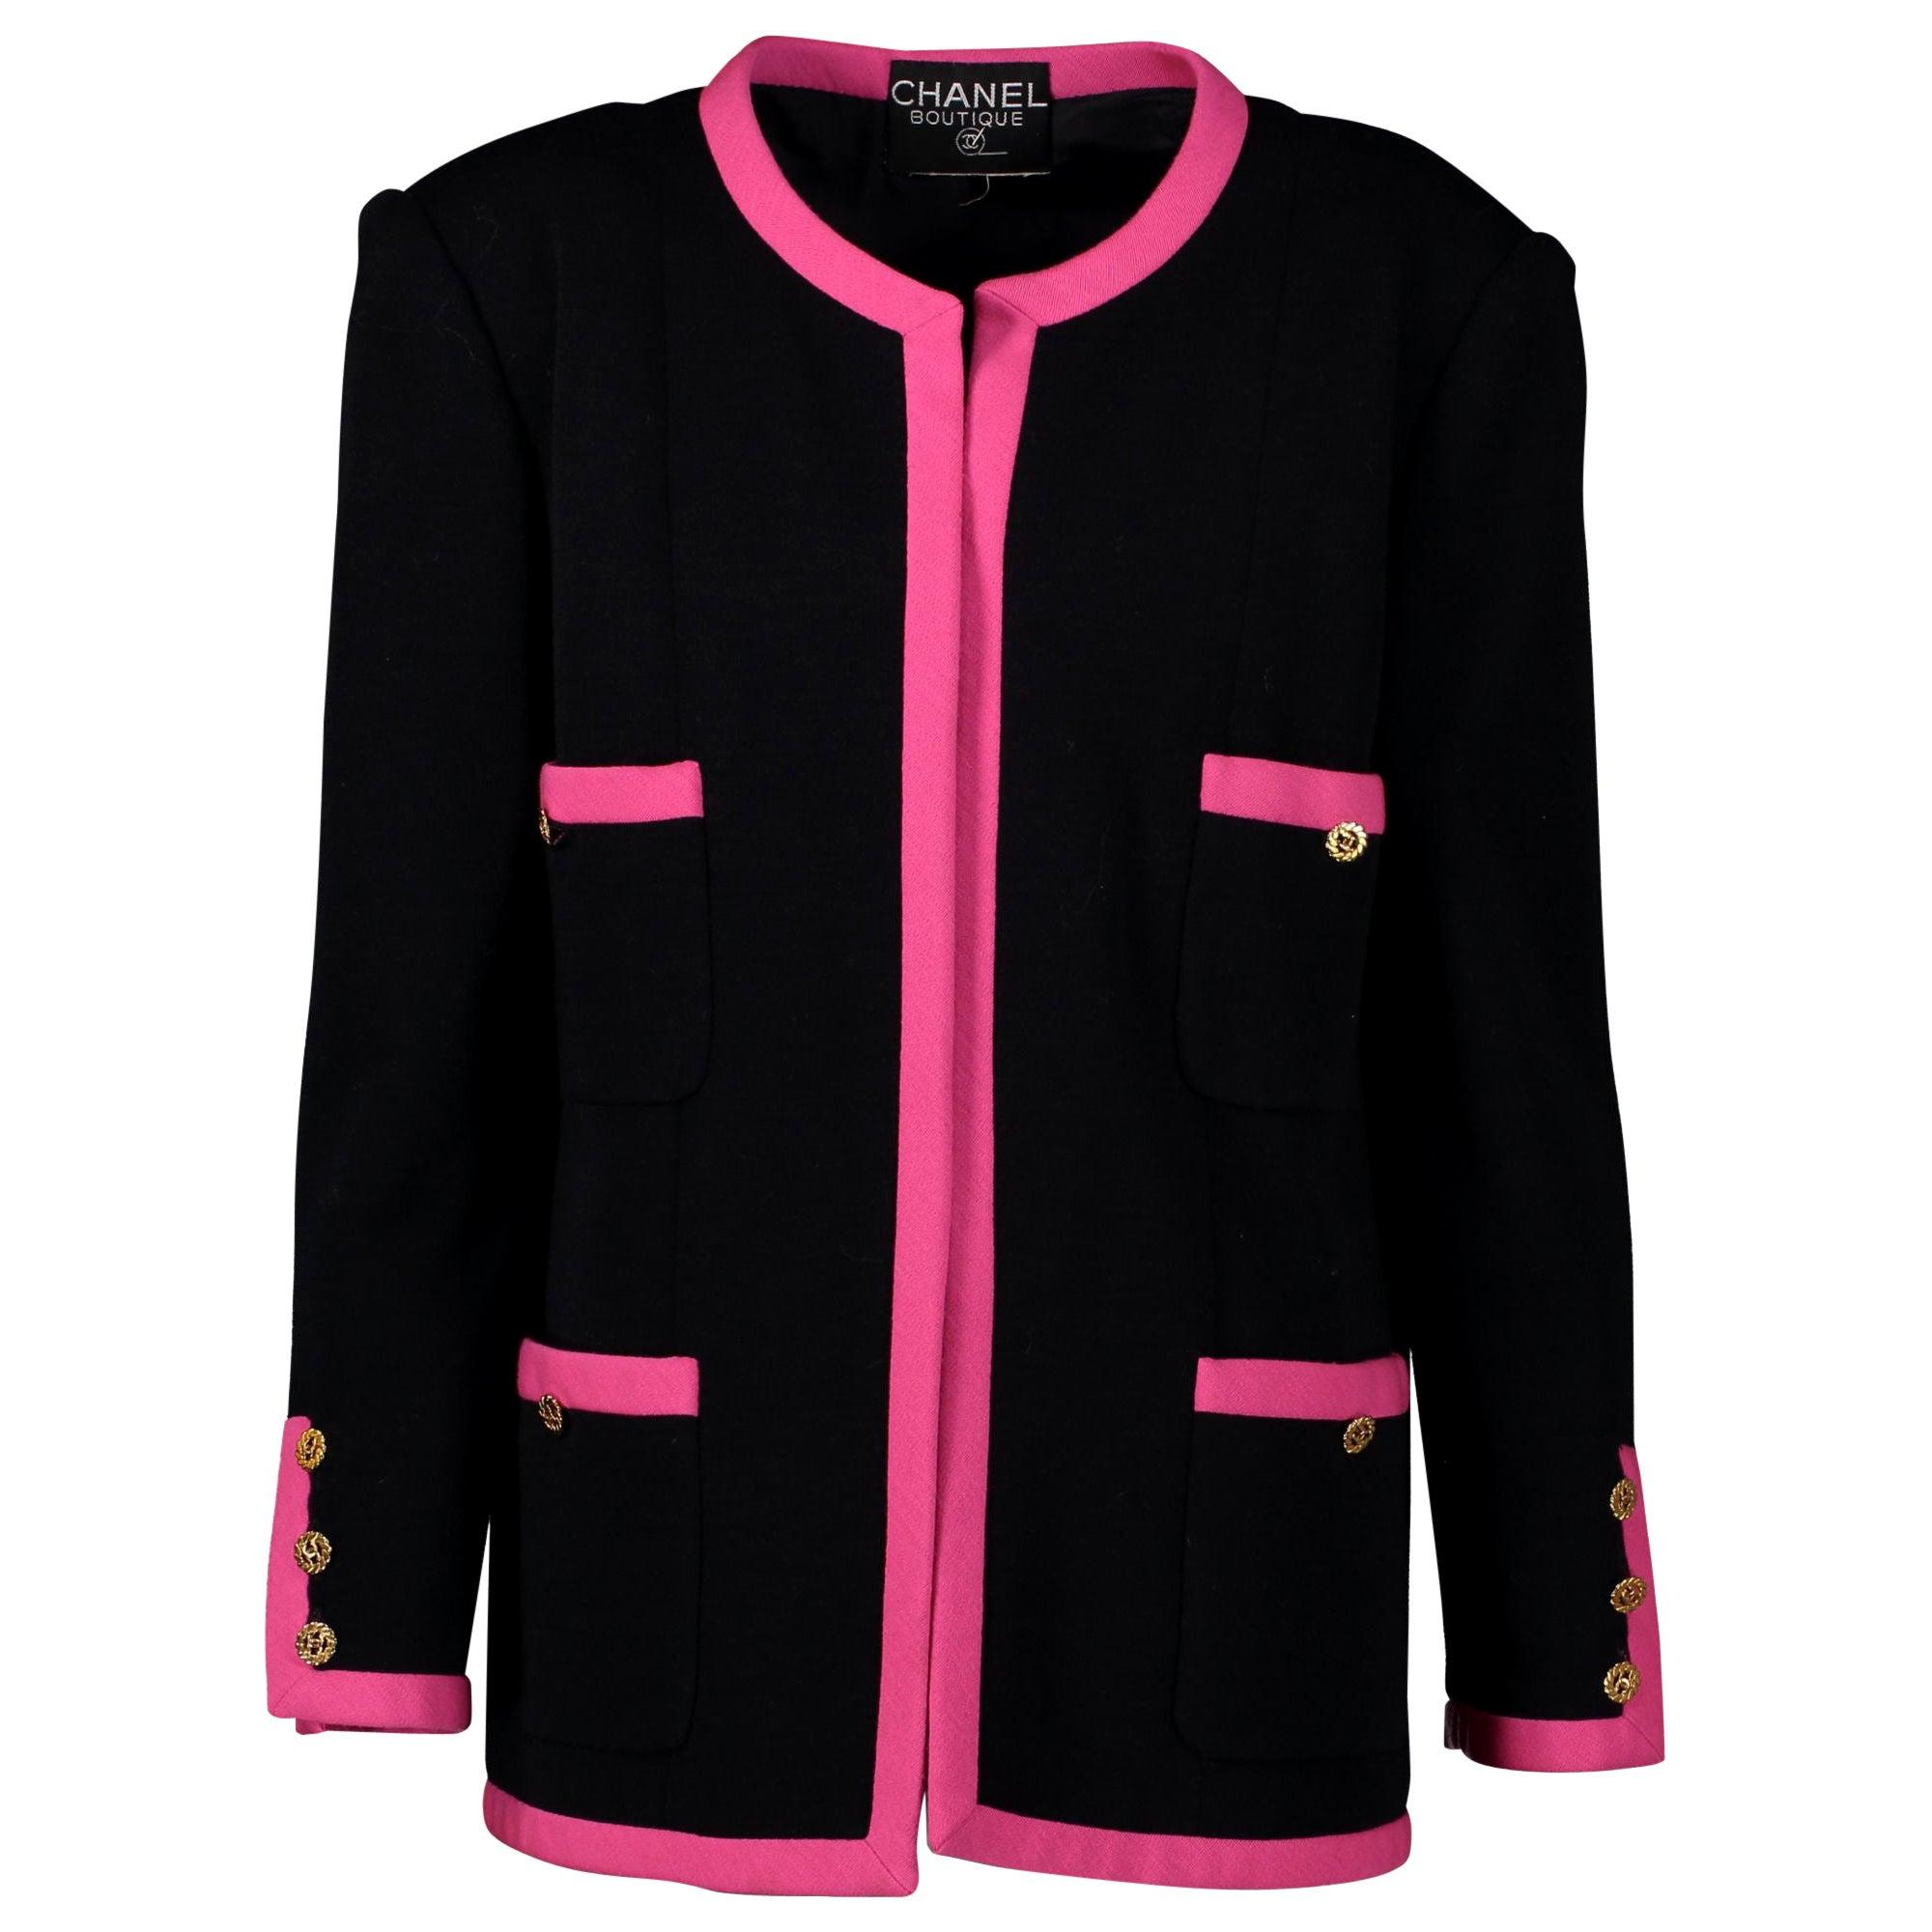 Chanel Black Pink Trim Jacket